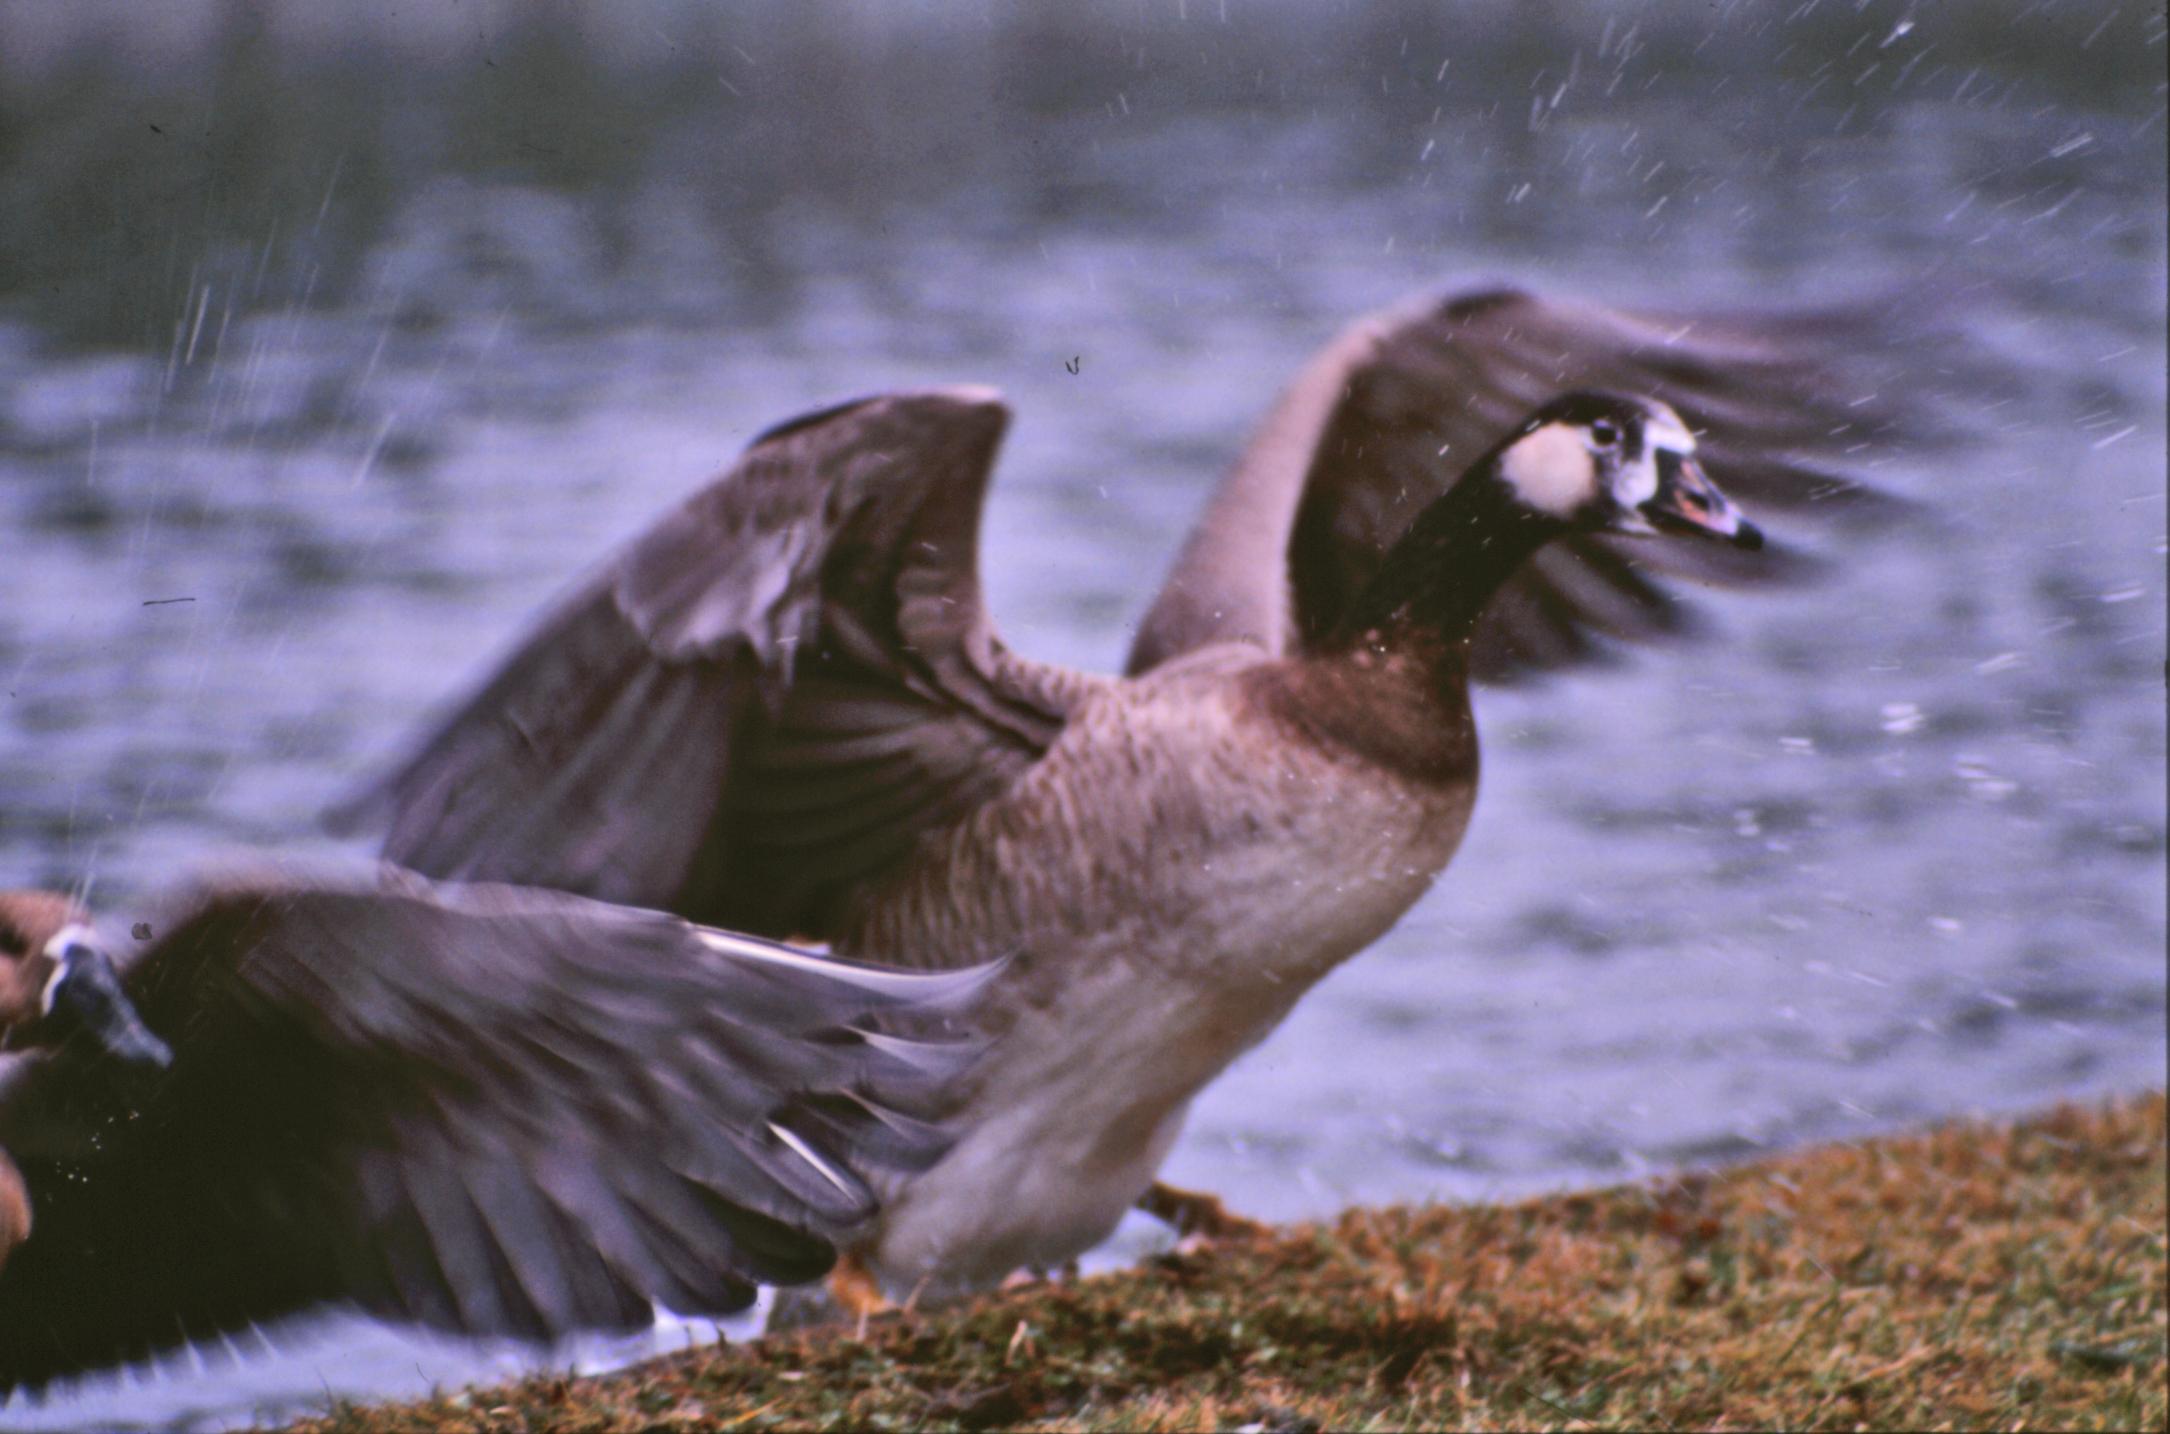 Geese, Animal, Bird, Goose, Wings, HQ Photo